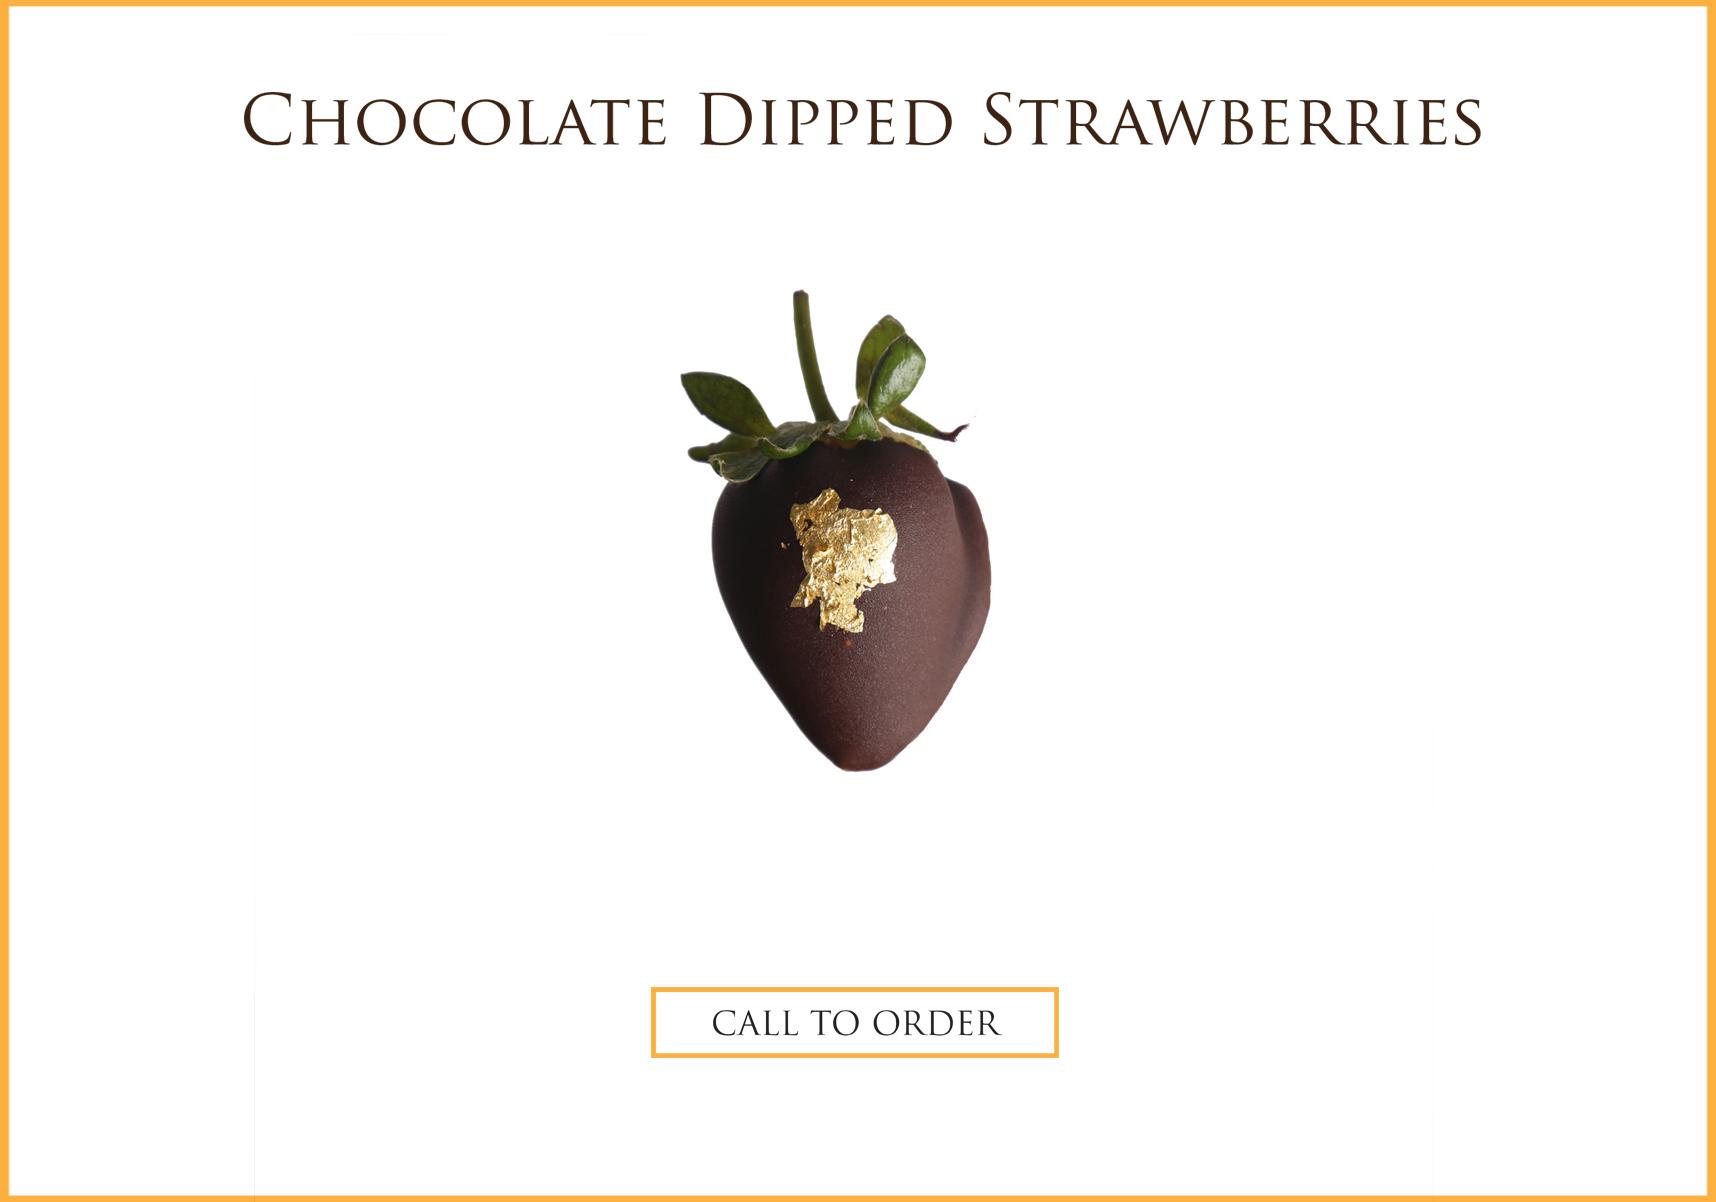 chocstrawberries 1.jpg